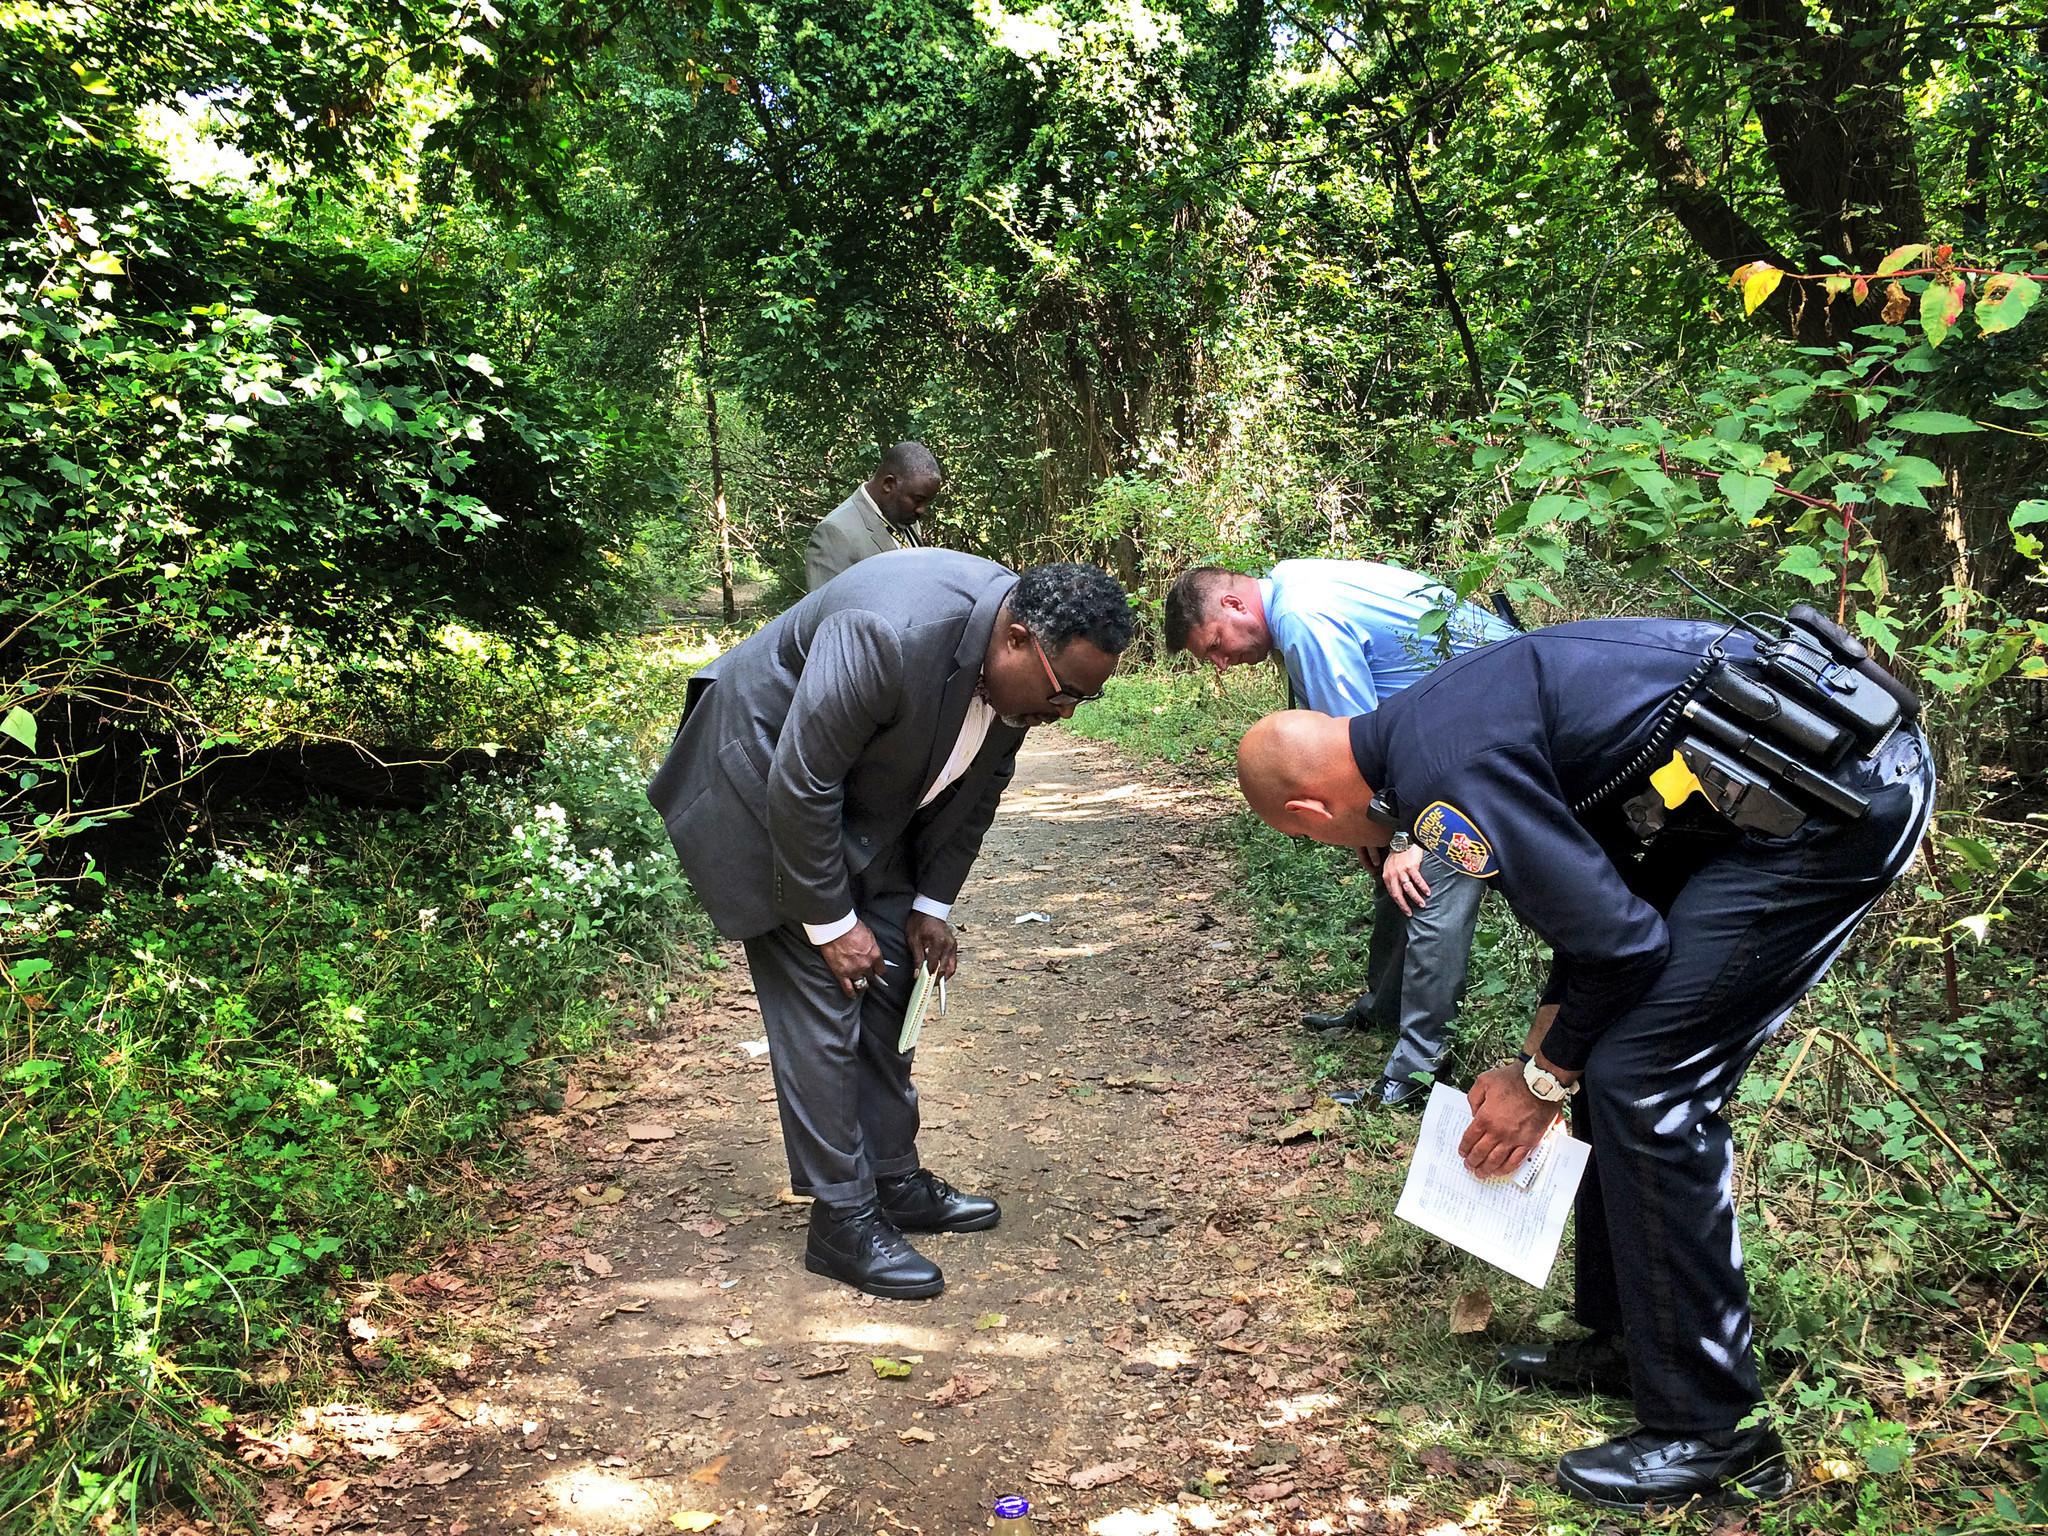 Chasing a killer: Detectives meet the Golden Child, but ...